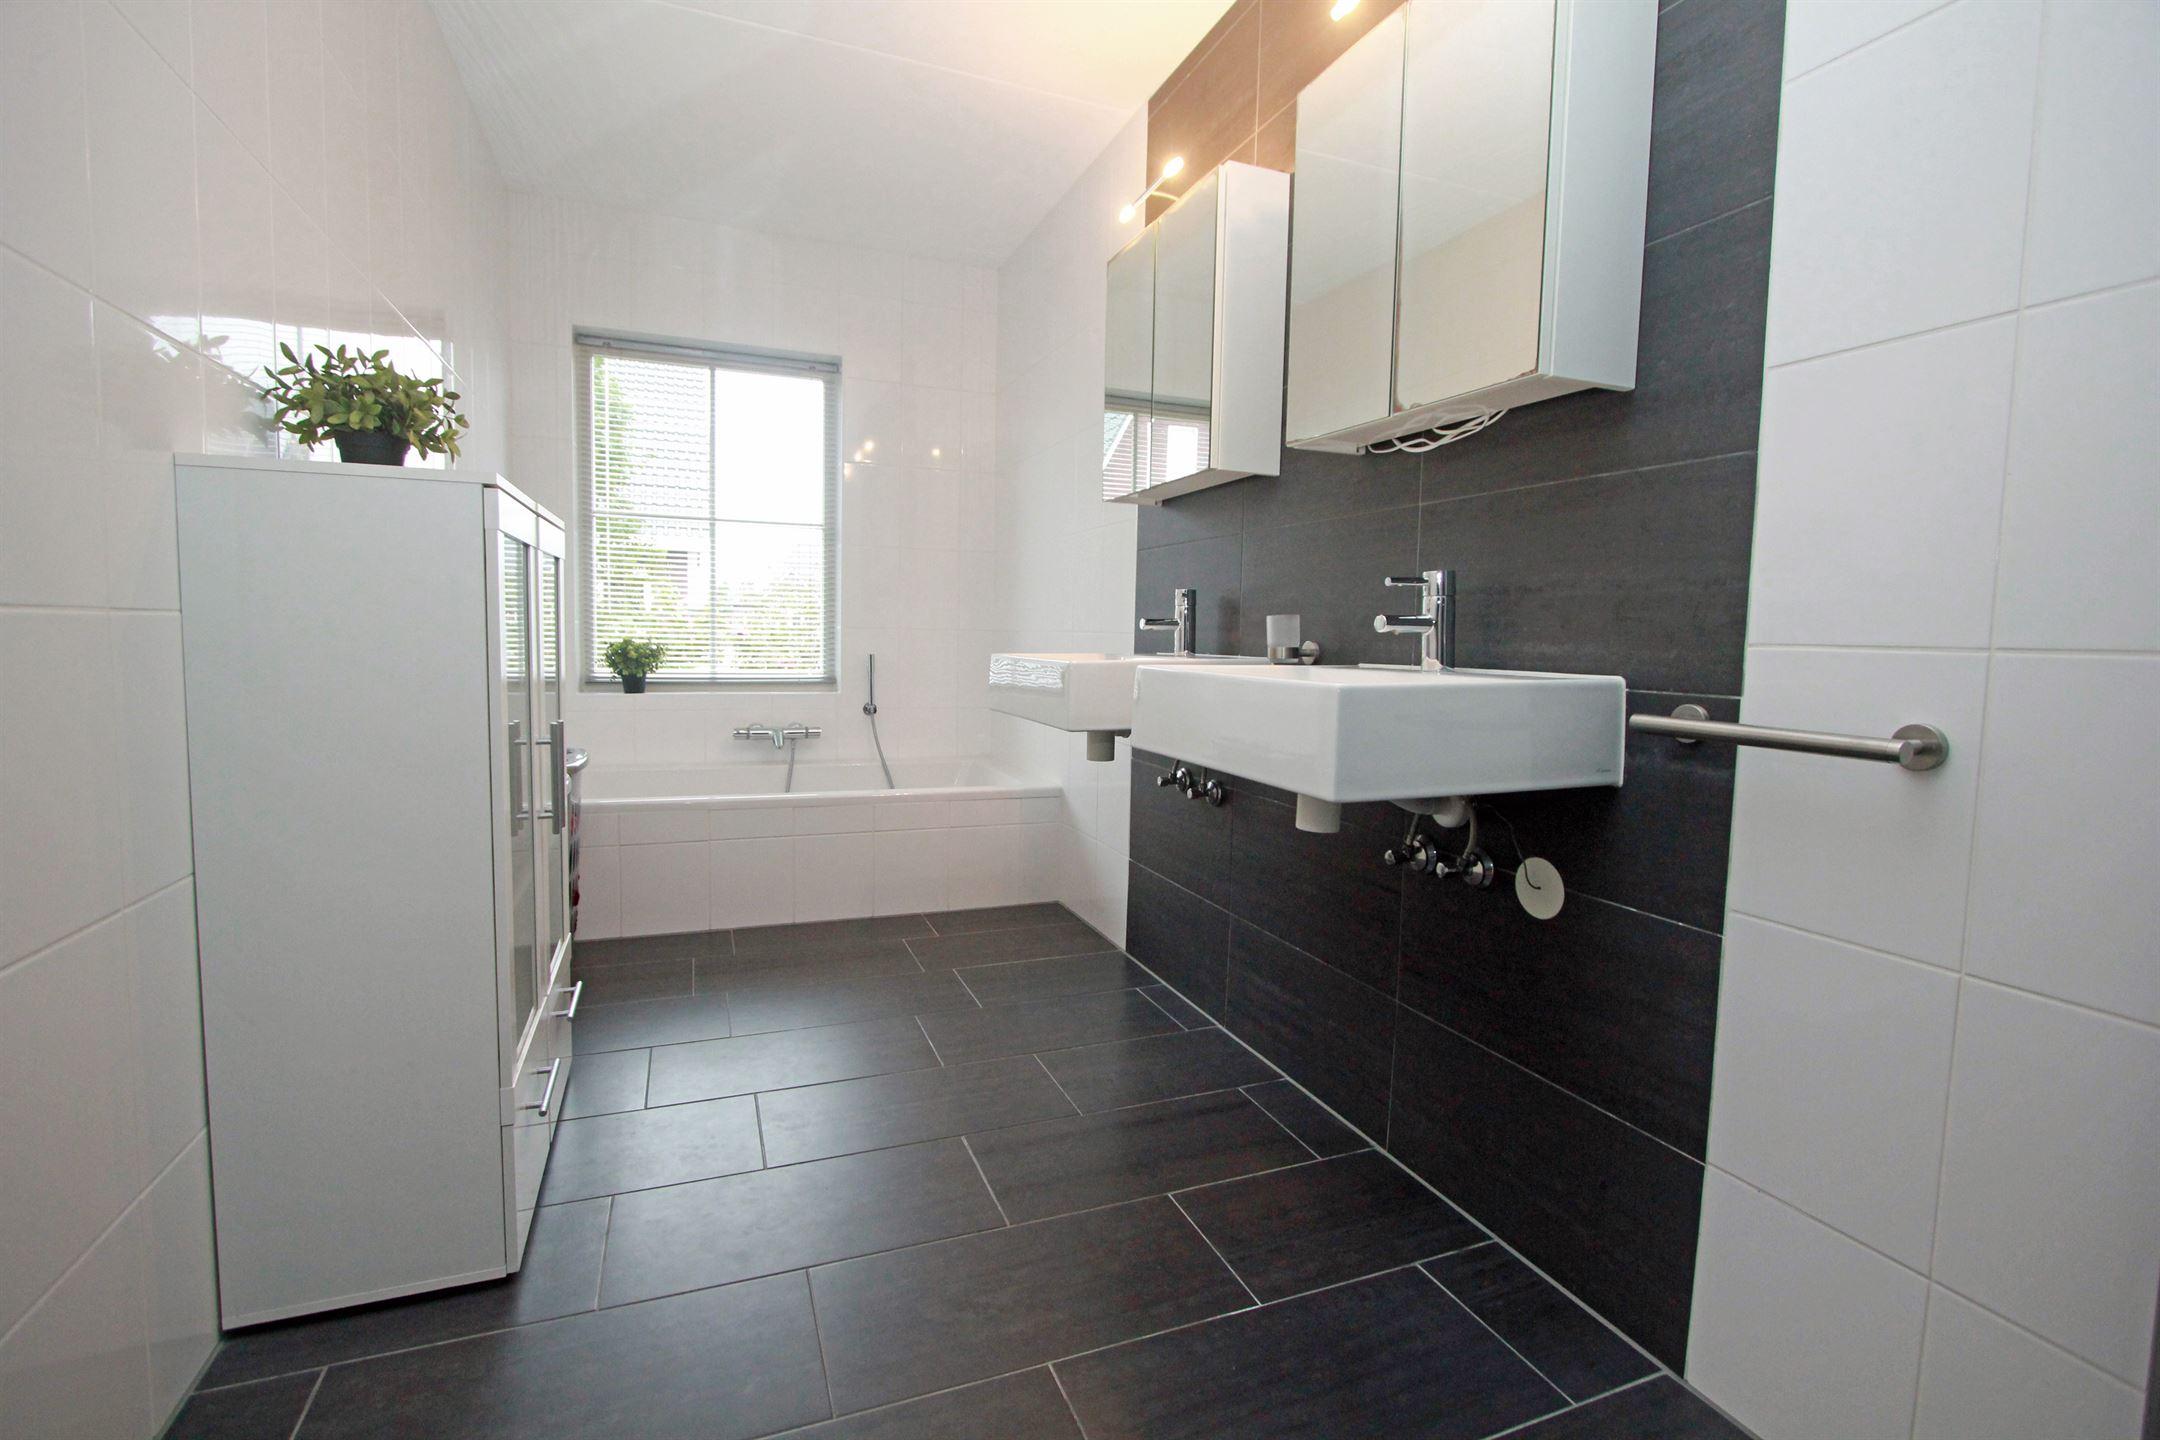 Keuken Design Emmeloord : Verkocht michelangelohage zr emmeloord funda